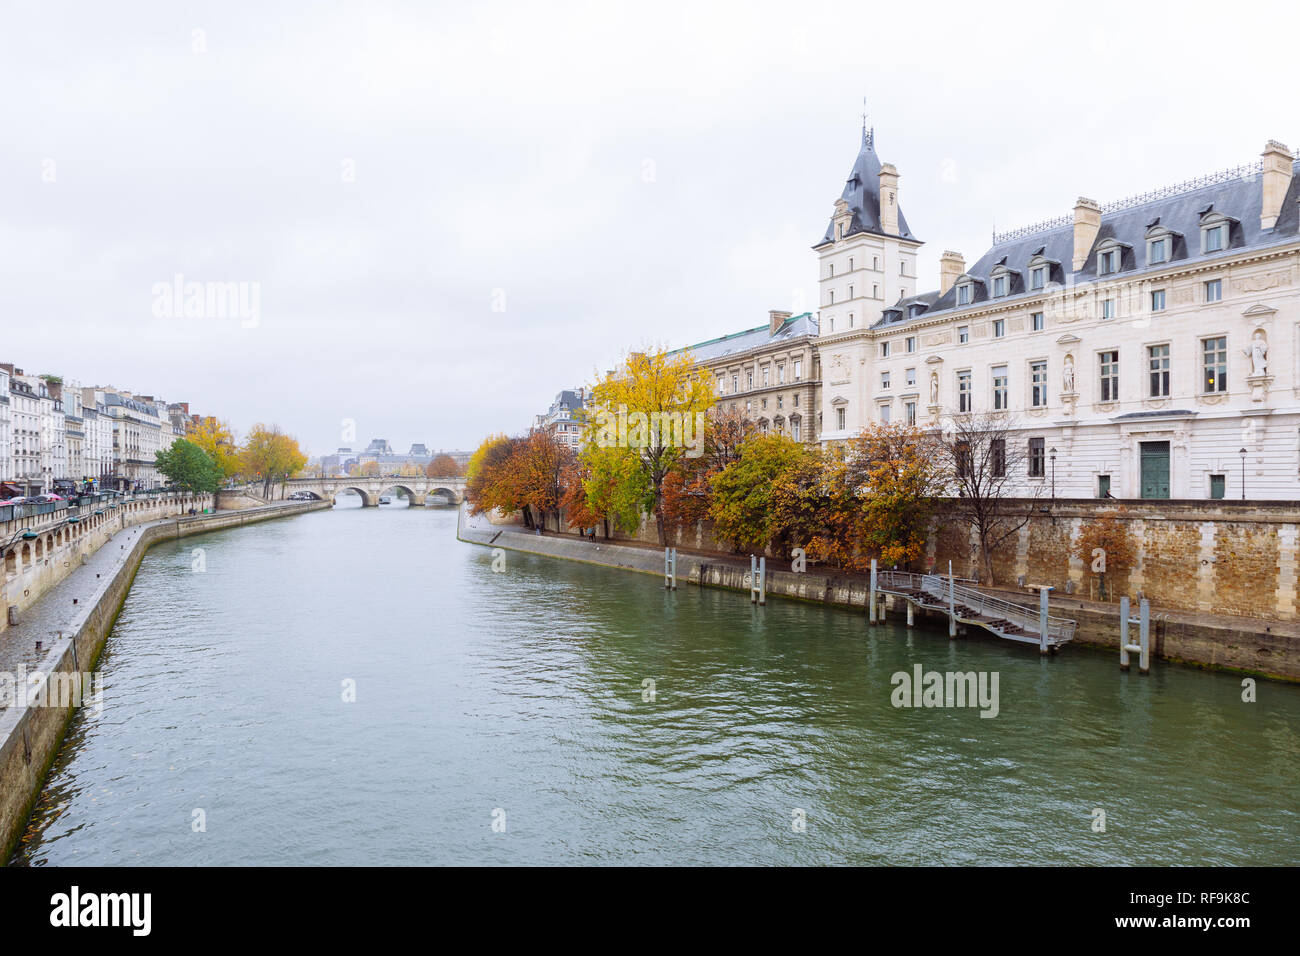 Paris (France) - The Palais de Justice formerly the Palais de la Cité in the Île de la Cité in central Paris, and the river Seine Stock Photo